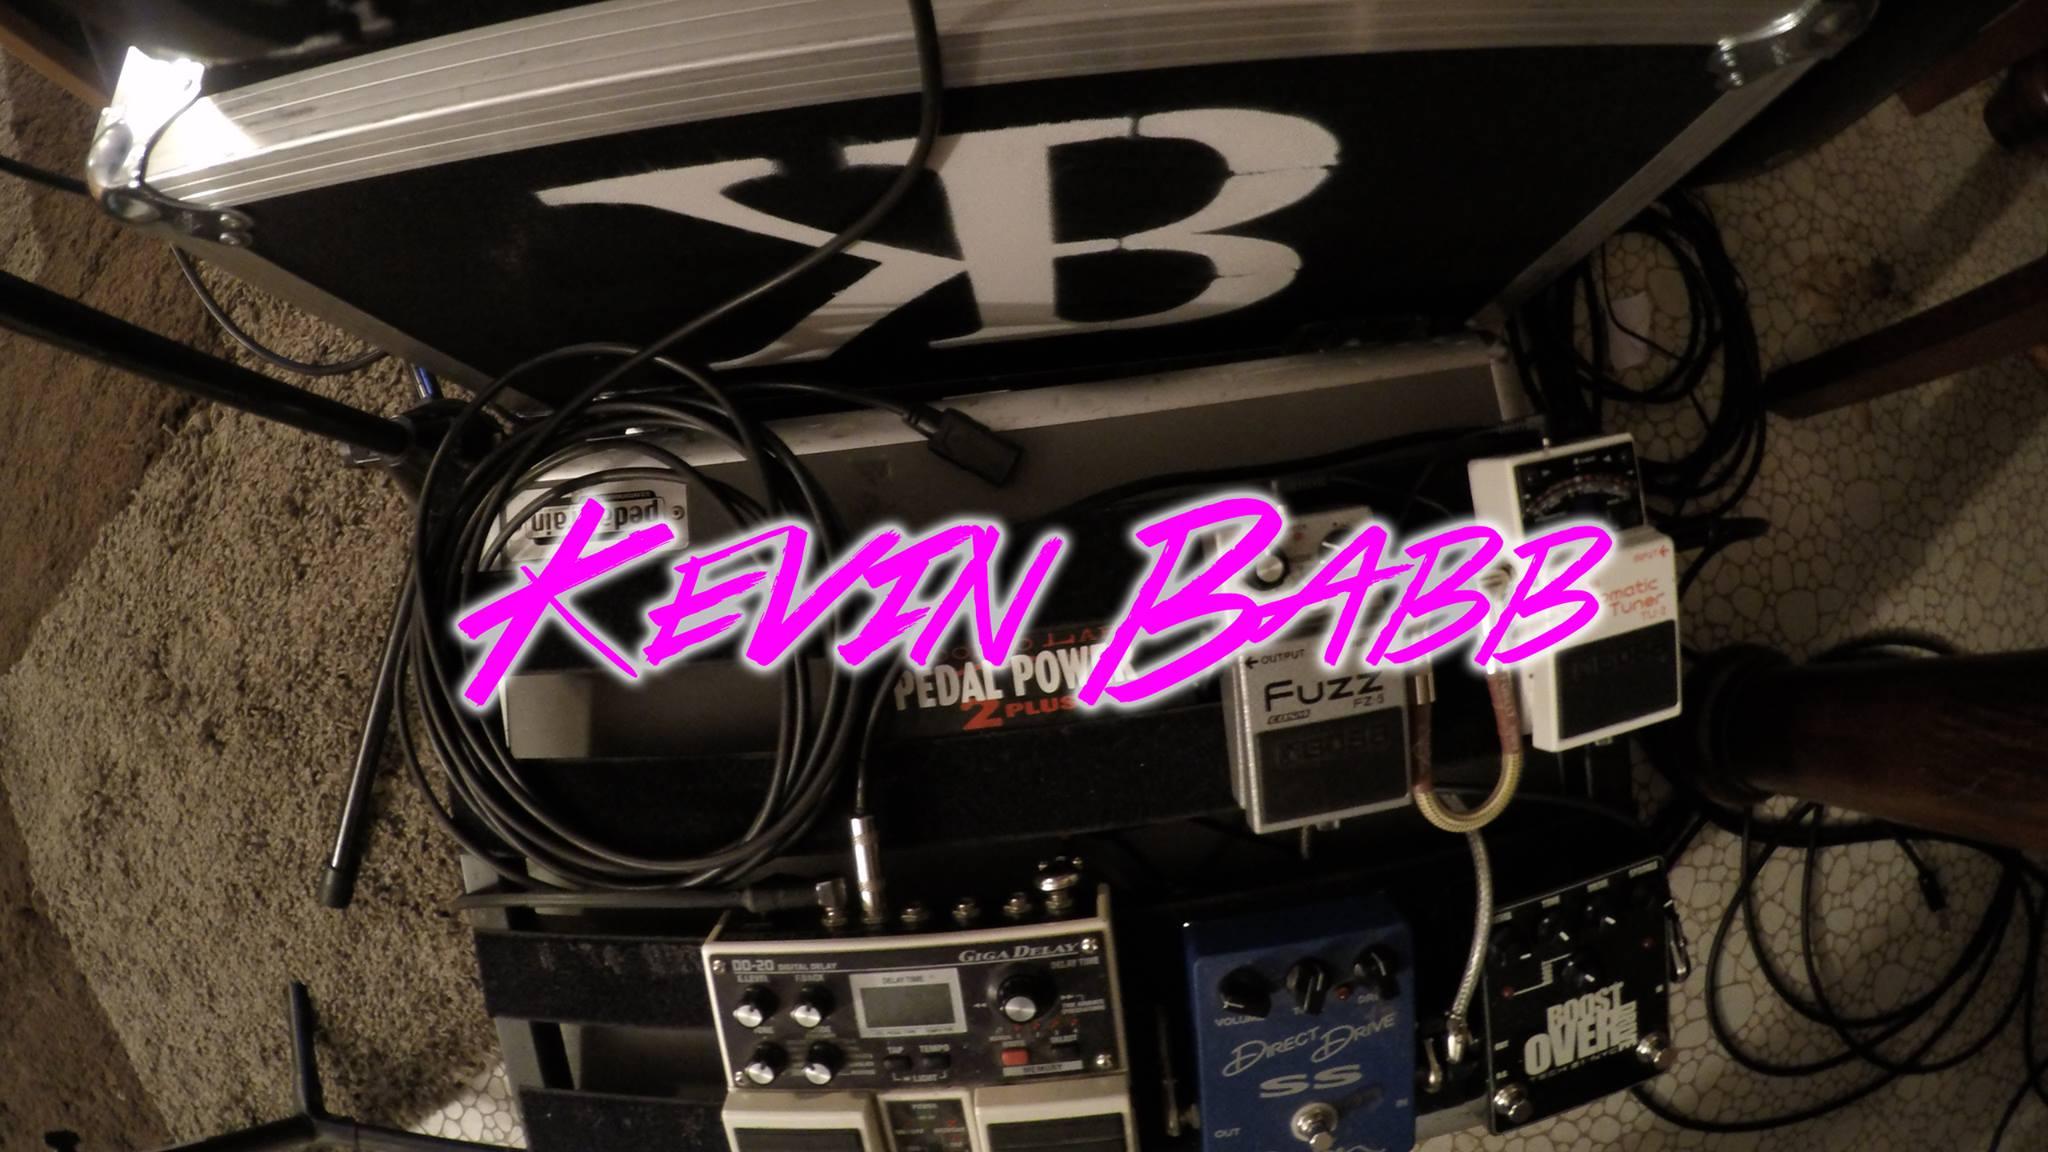 Kevin Babb